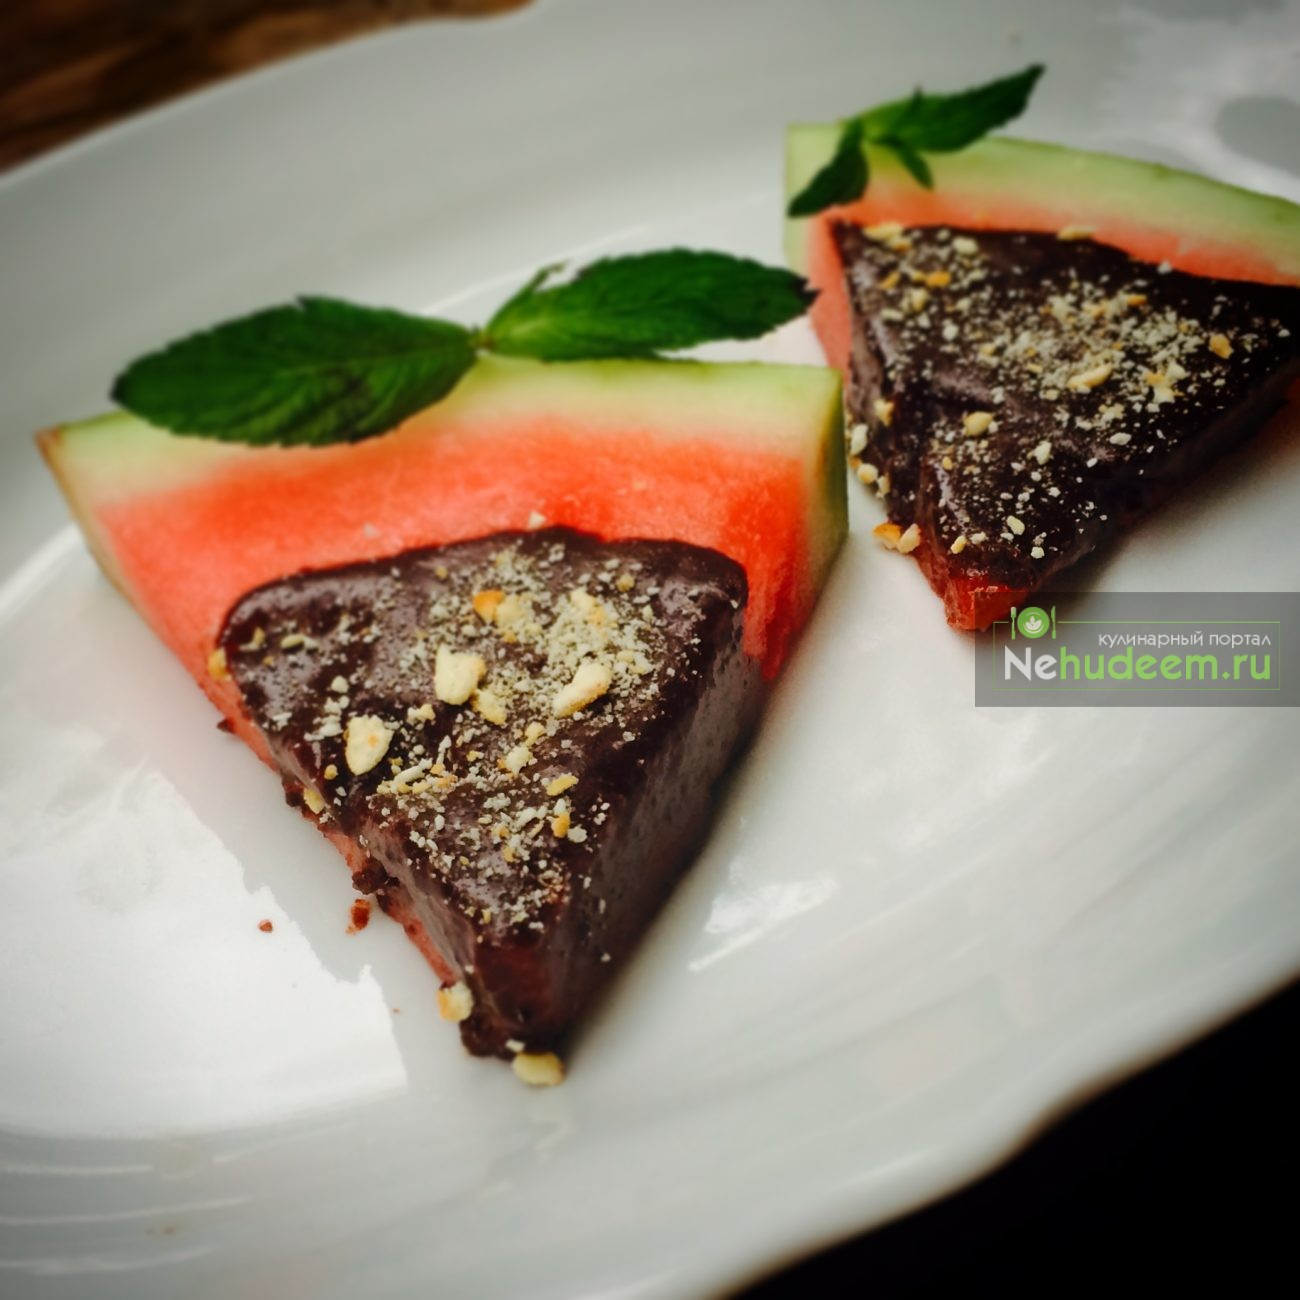 Арбуз в шоколаде